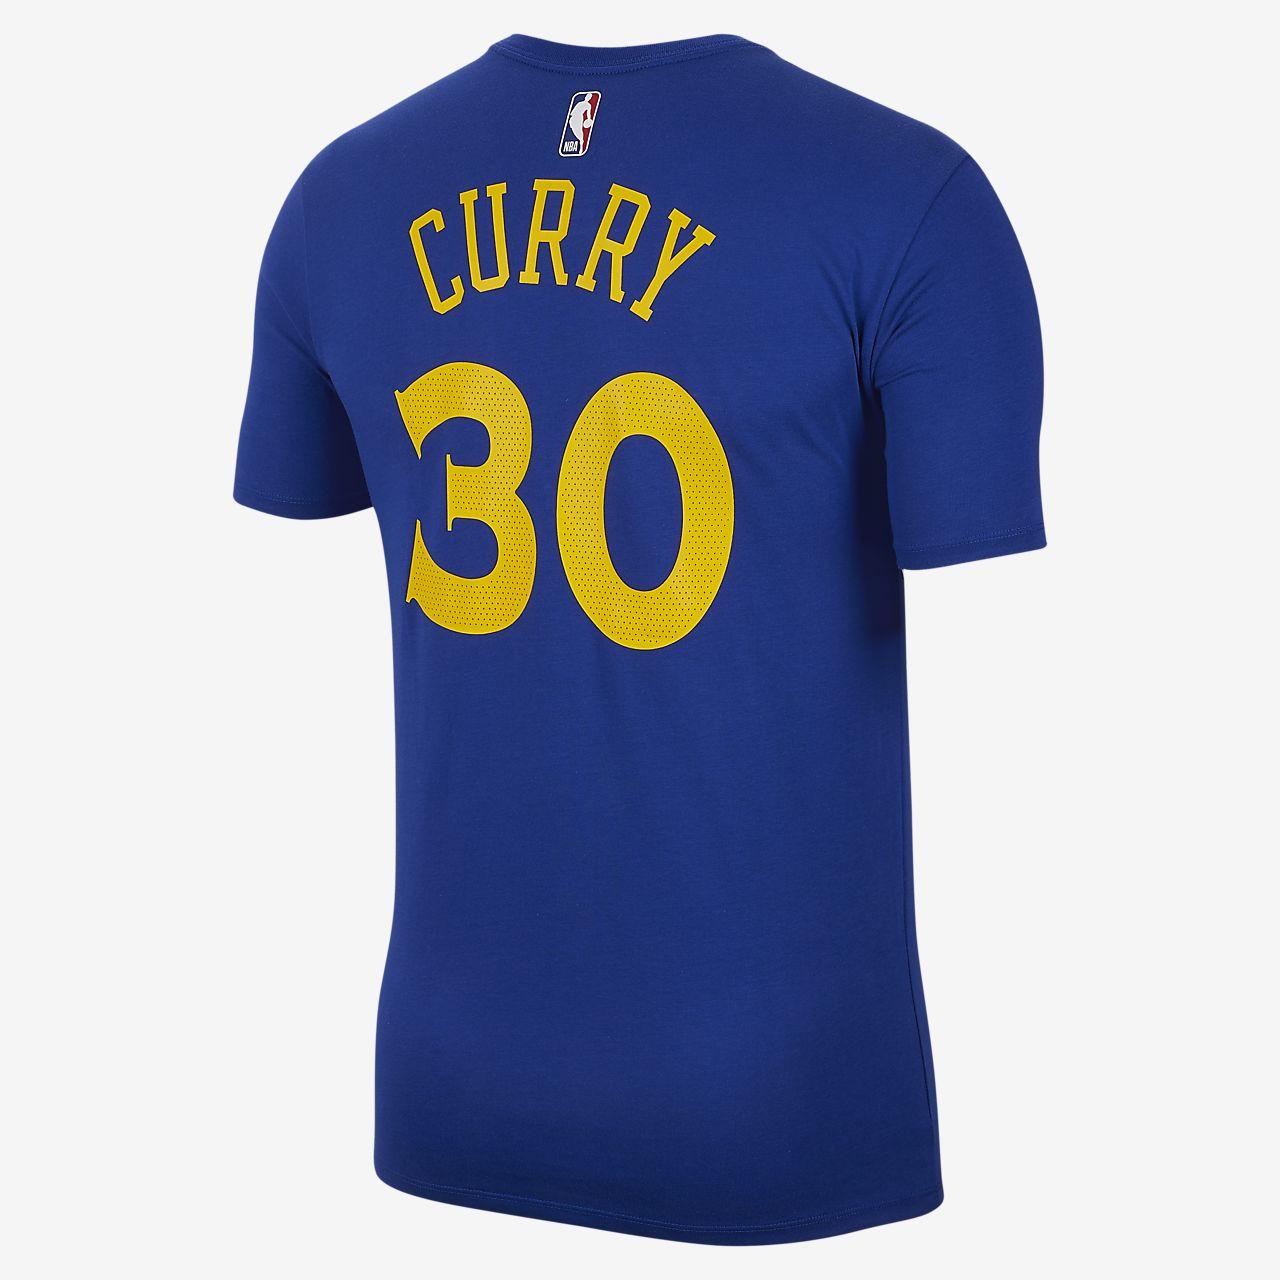 nike dry nba warriors curry men 39 s basketball t shirt. Black Bedroom Furniture Sets. Home Design Ideas